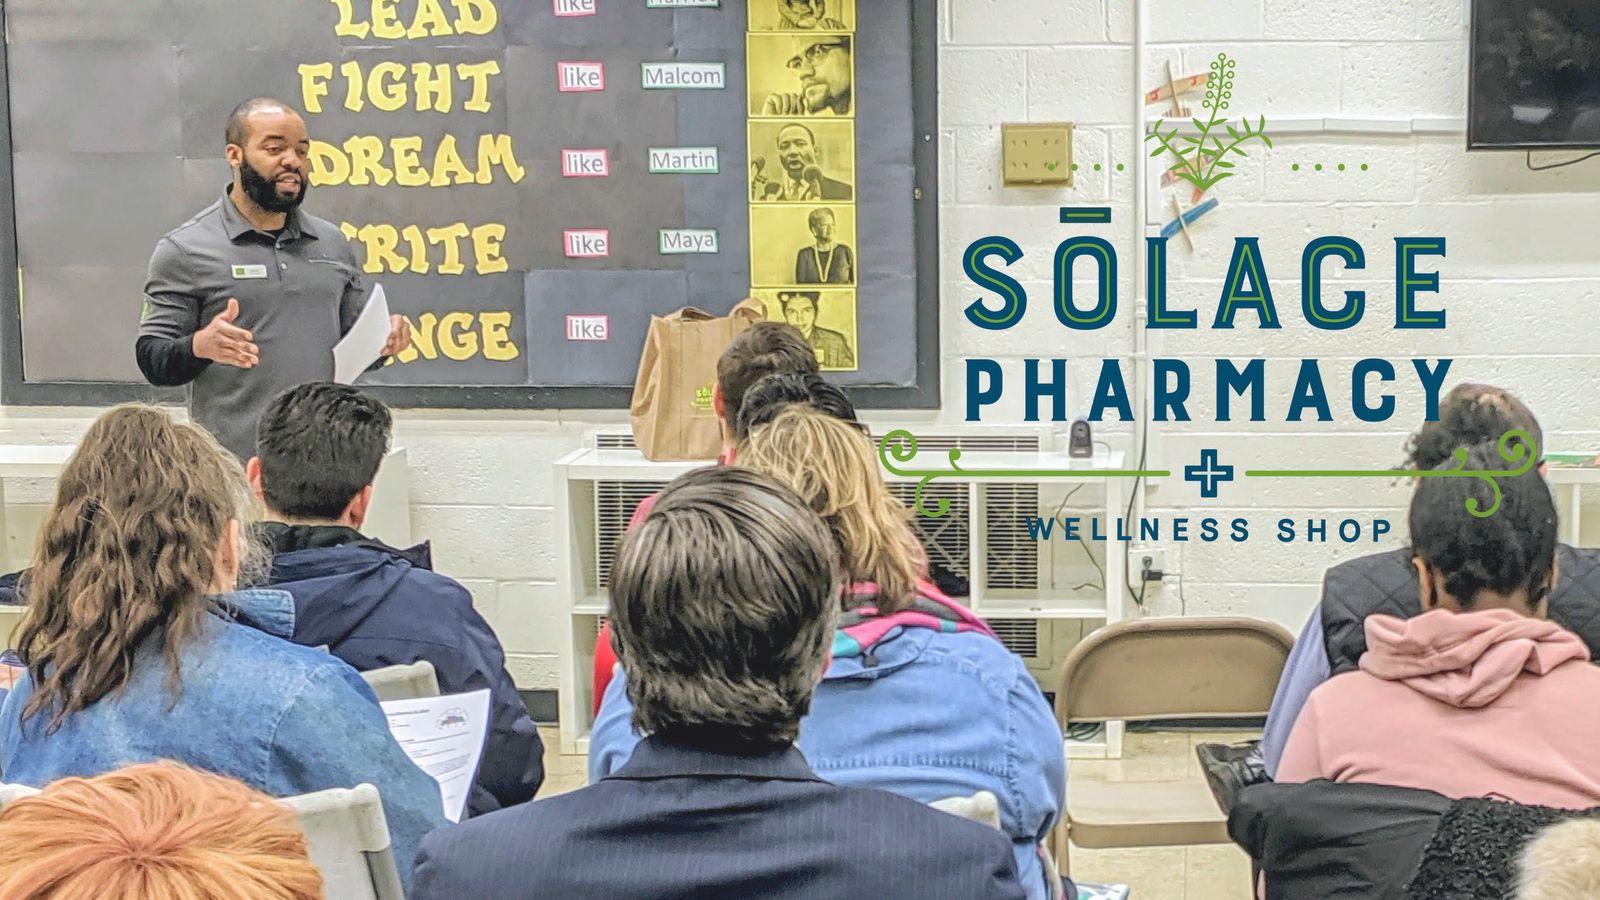 solace_pharmacy_community_meeting_pharmacist_16x9.jpg